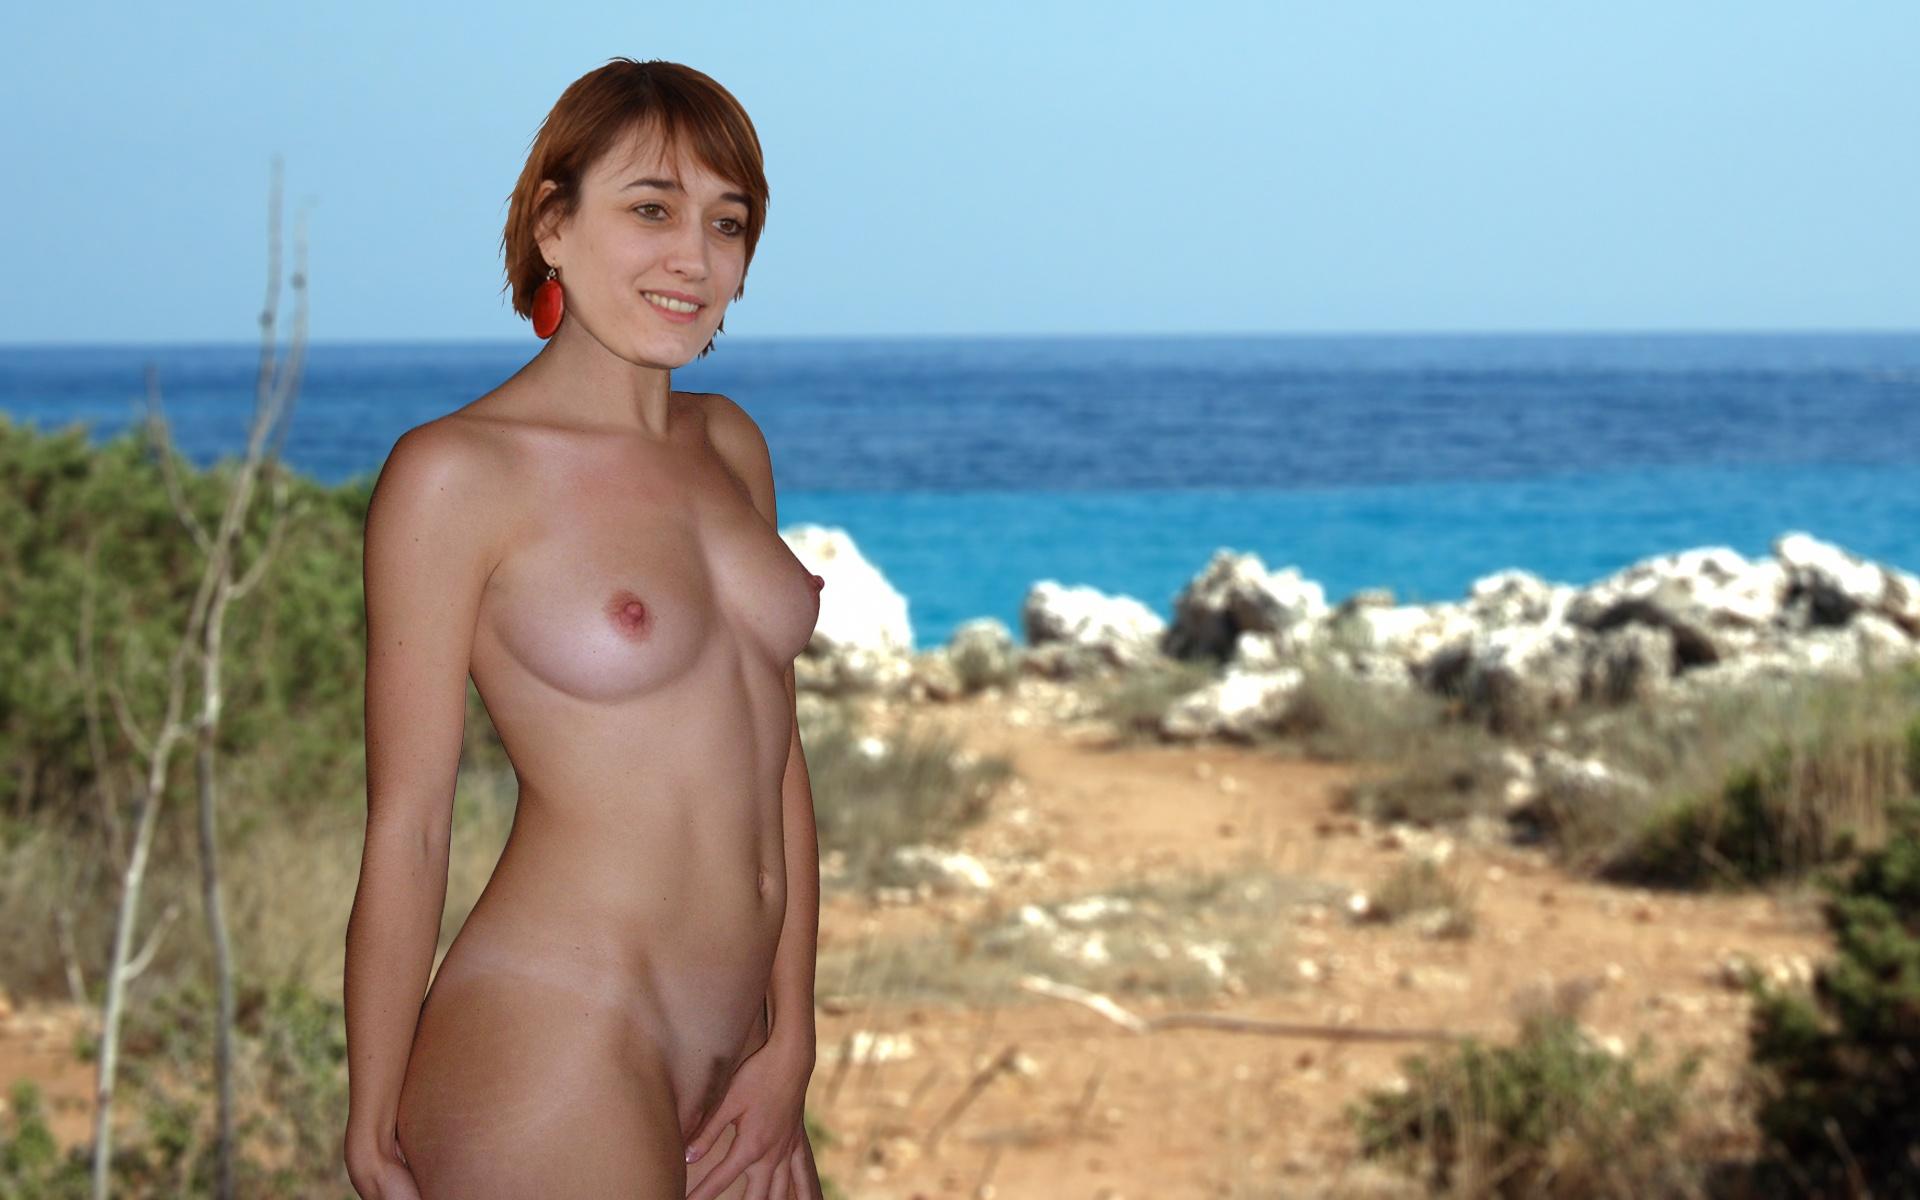 Erotic Pics Of Nude Women